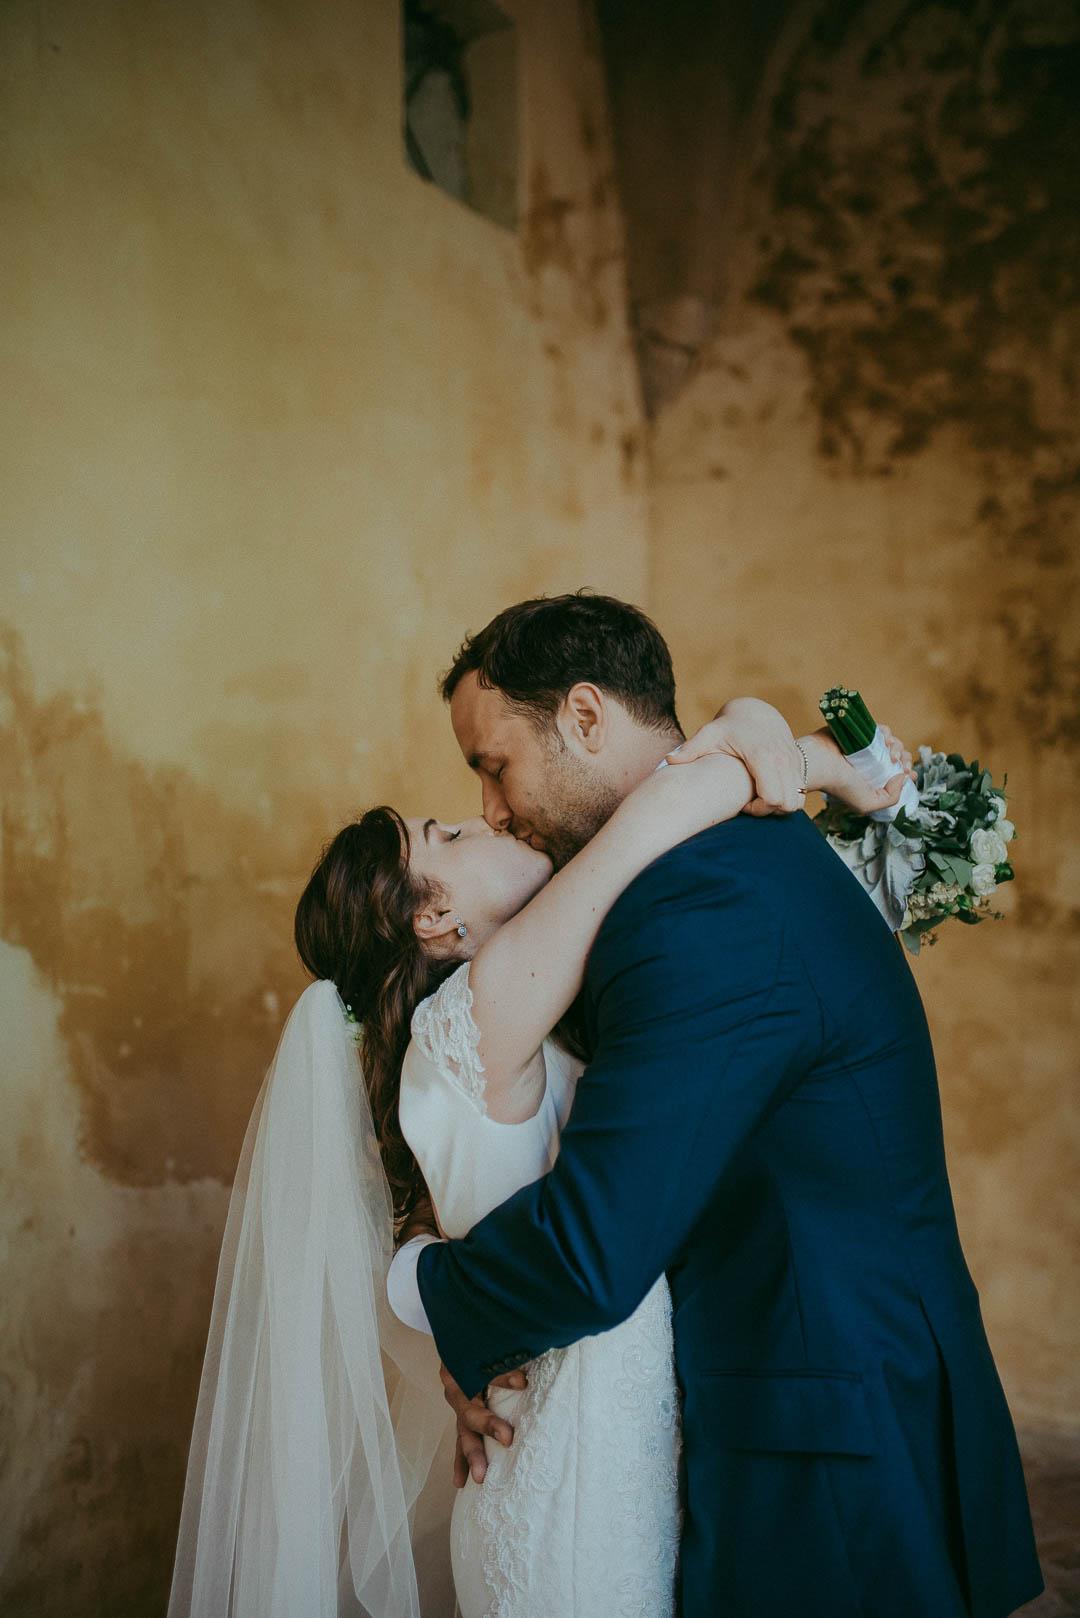 wedding-photographer-destination-fineart-bespoke-reportage-sorrento-parcodeiprincipi-vivianeizzo-spazio46-58